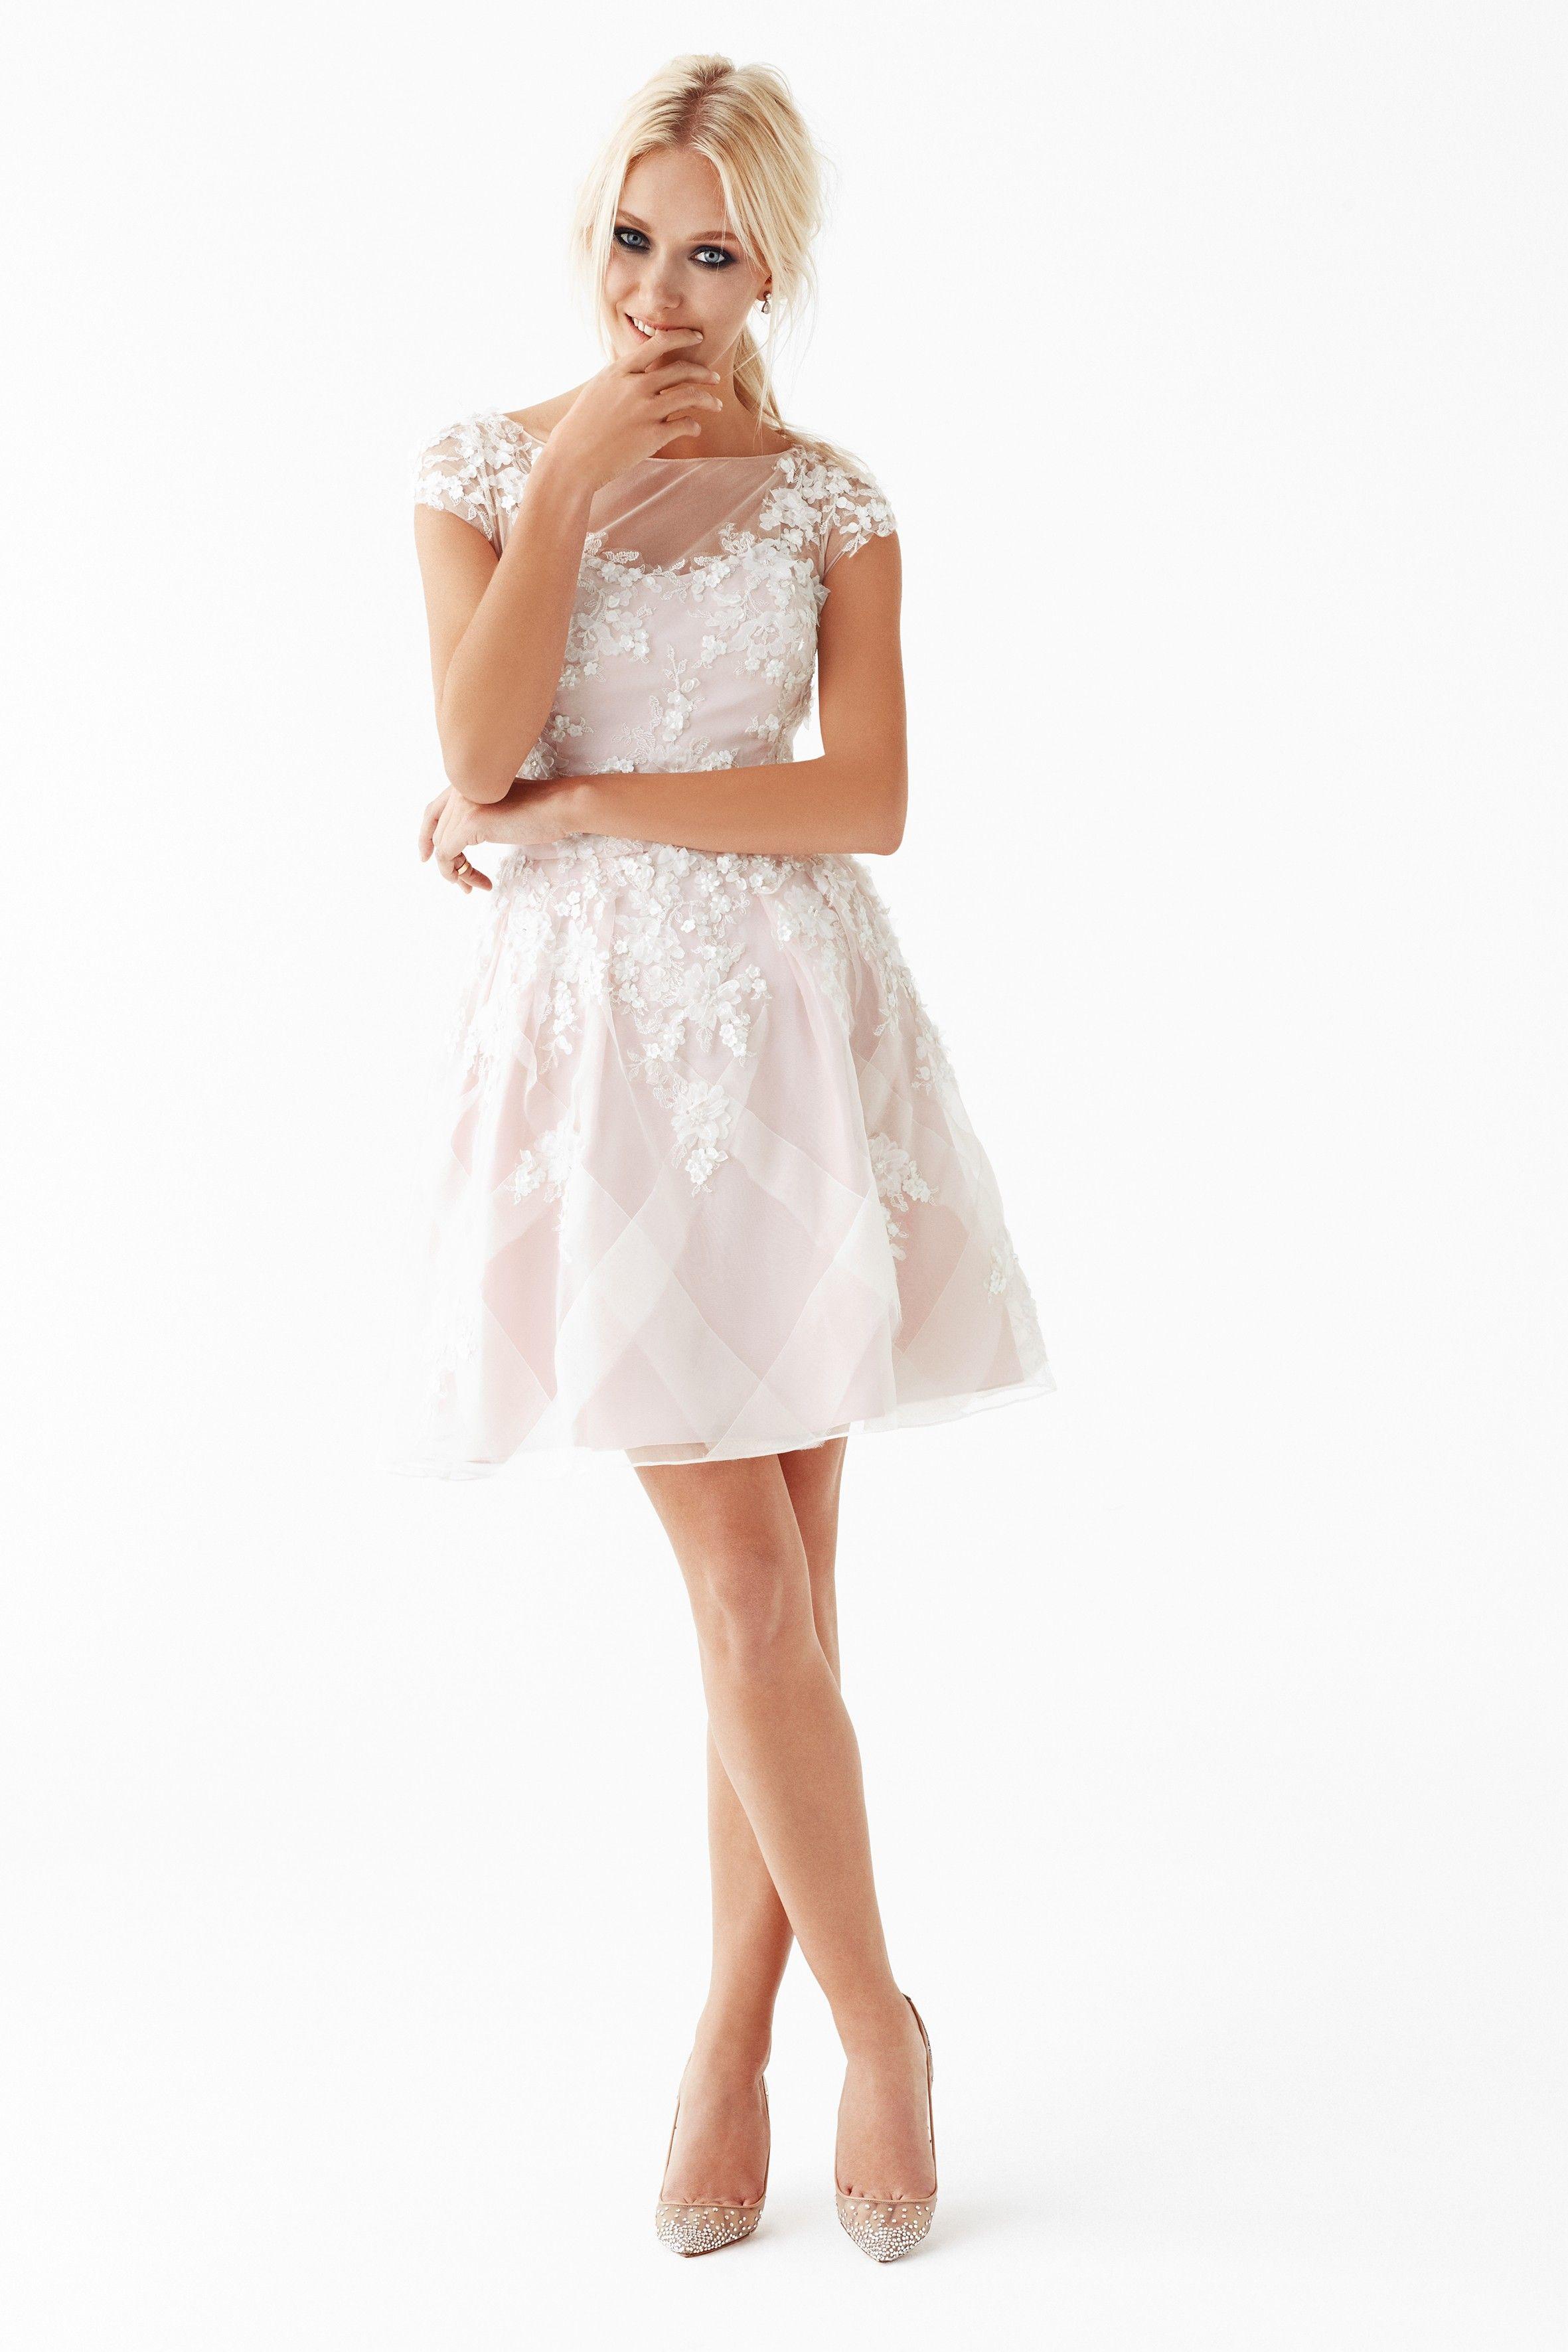 Kısa Nişan Elbisesi | Kıyafet Seçenekleri | Pinterest | Engagement ...